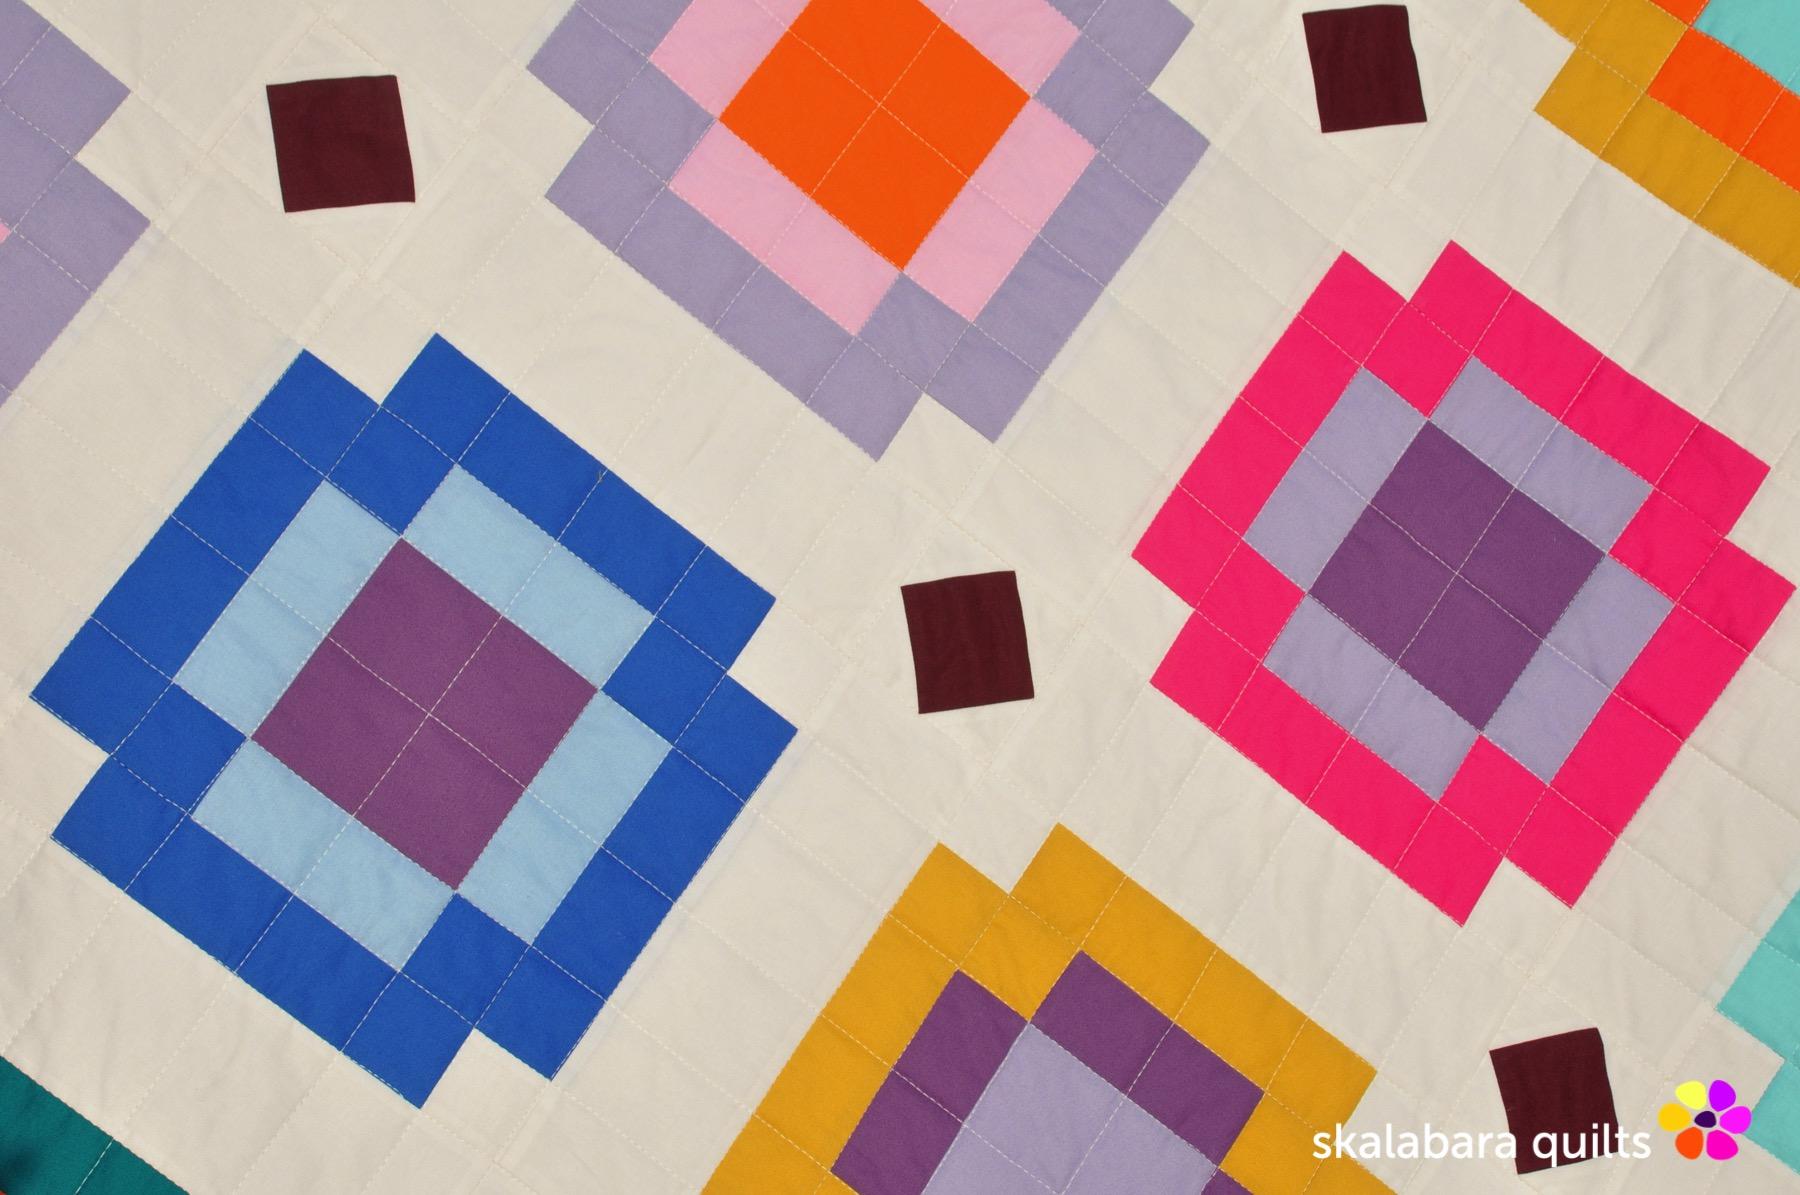 radiate quilt detail 7 - skalabara quilts